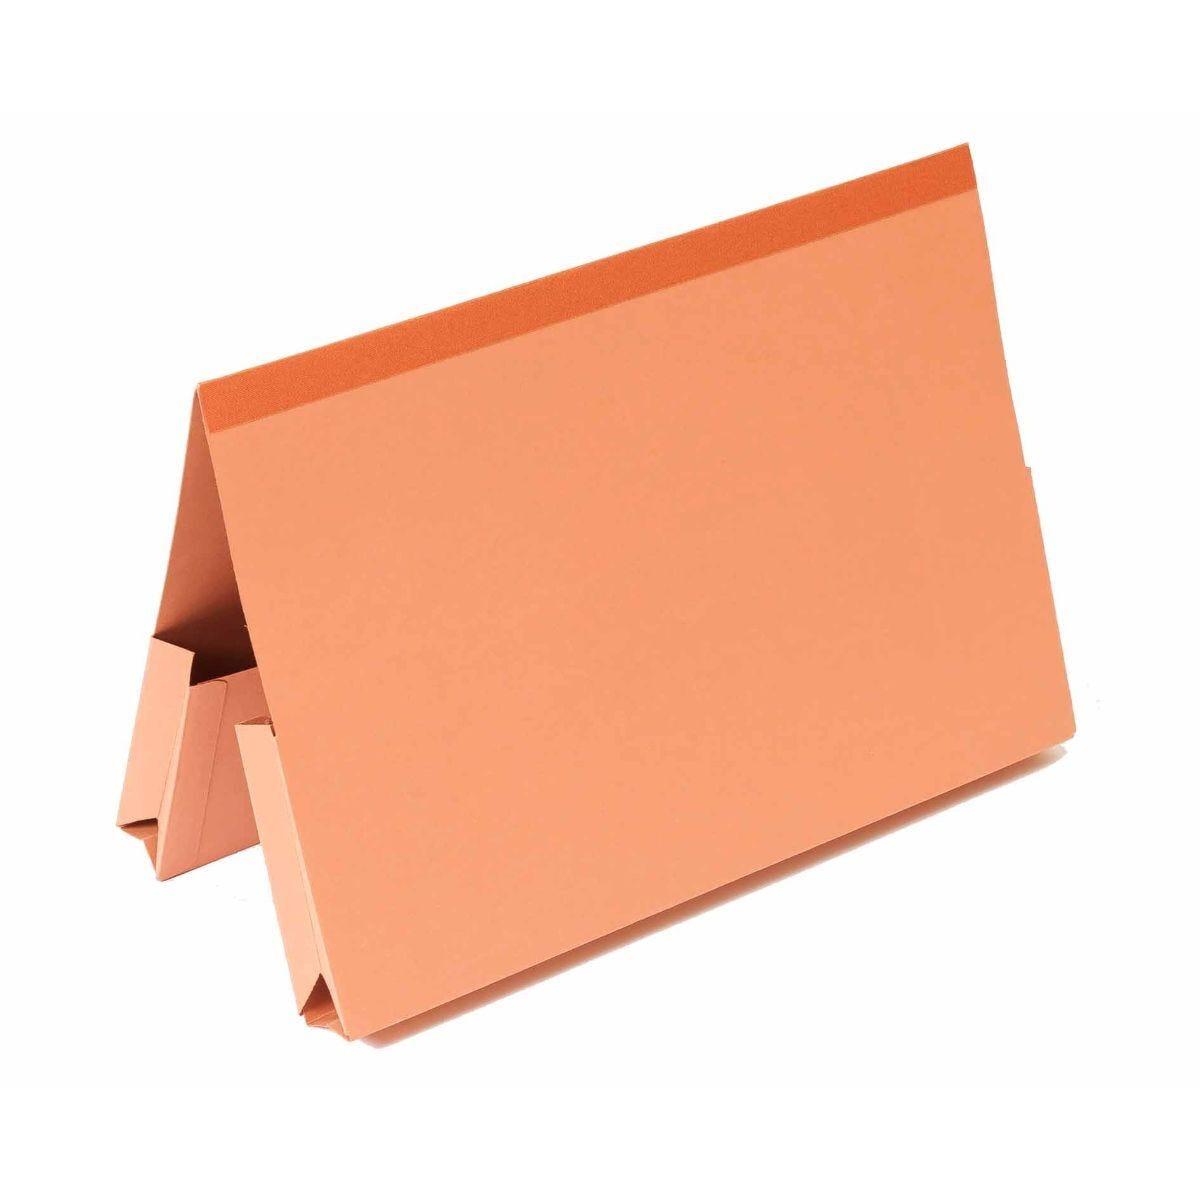 Exacompta Guildhall Reinforced Double Pocket Wallets Foolscap Pack of 25 315gsm Orange